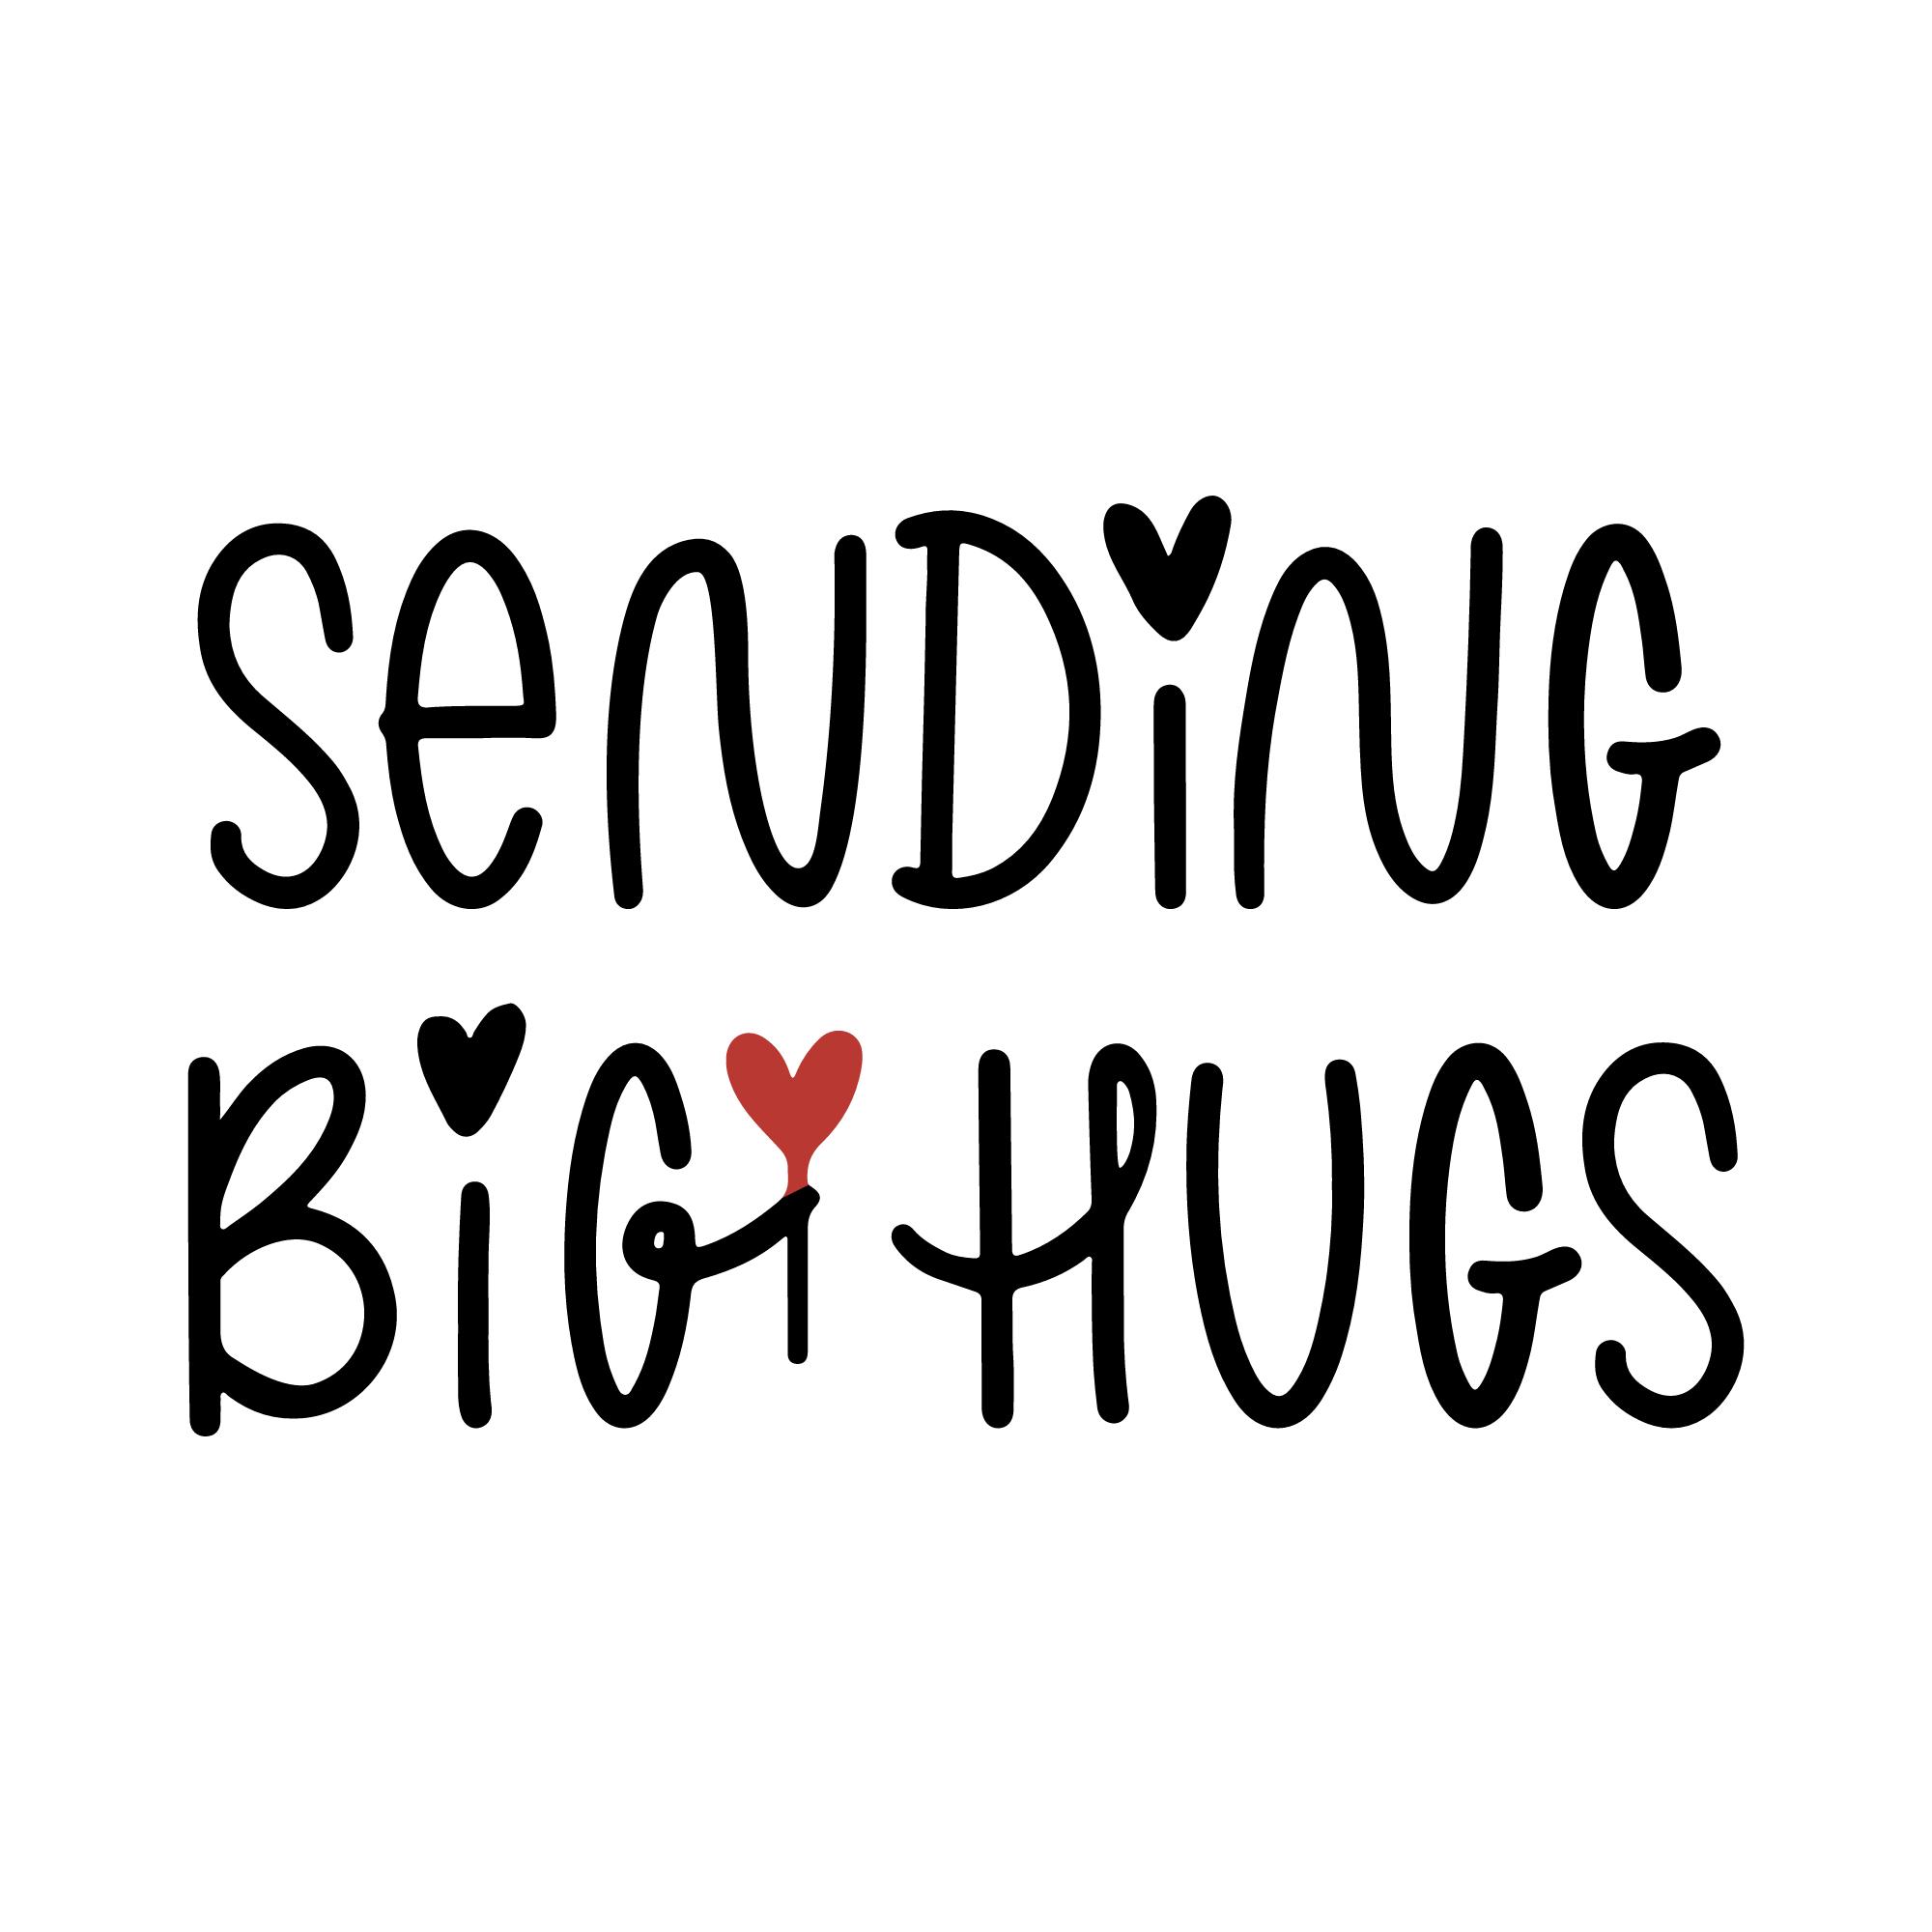 Sending big hugs